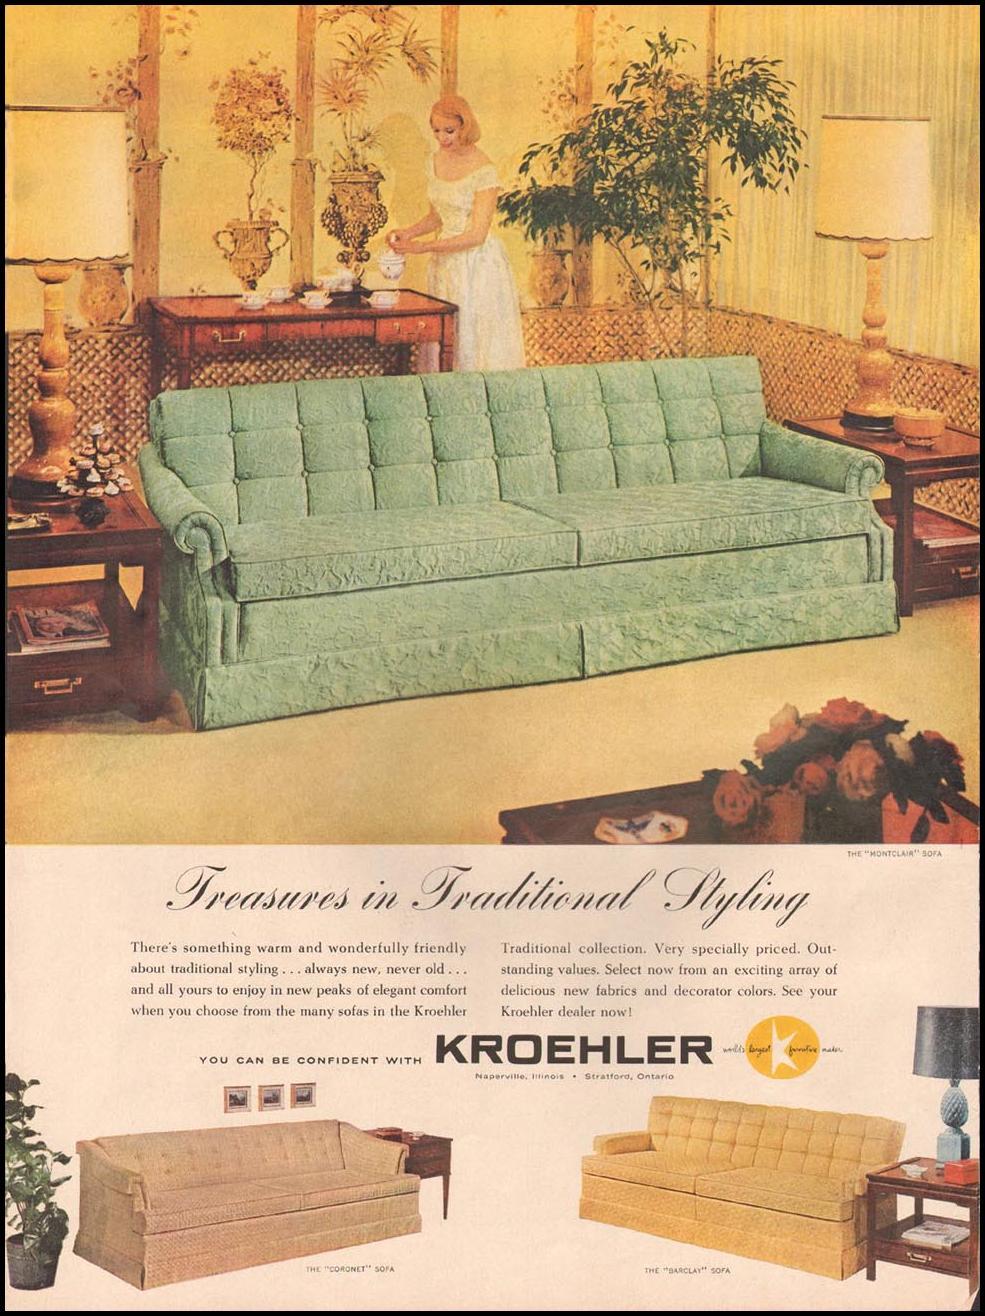 KROEHLER SOFAS LIFE 10/05/1959